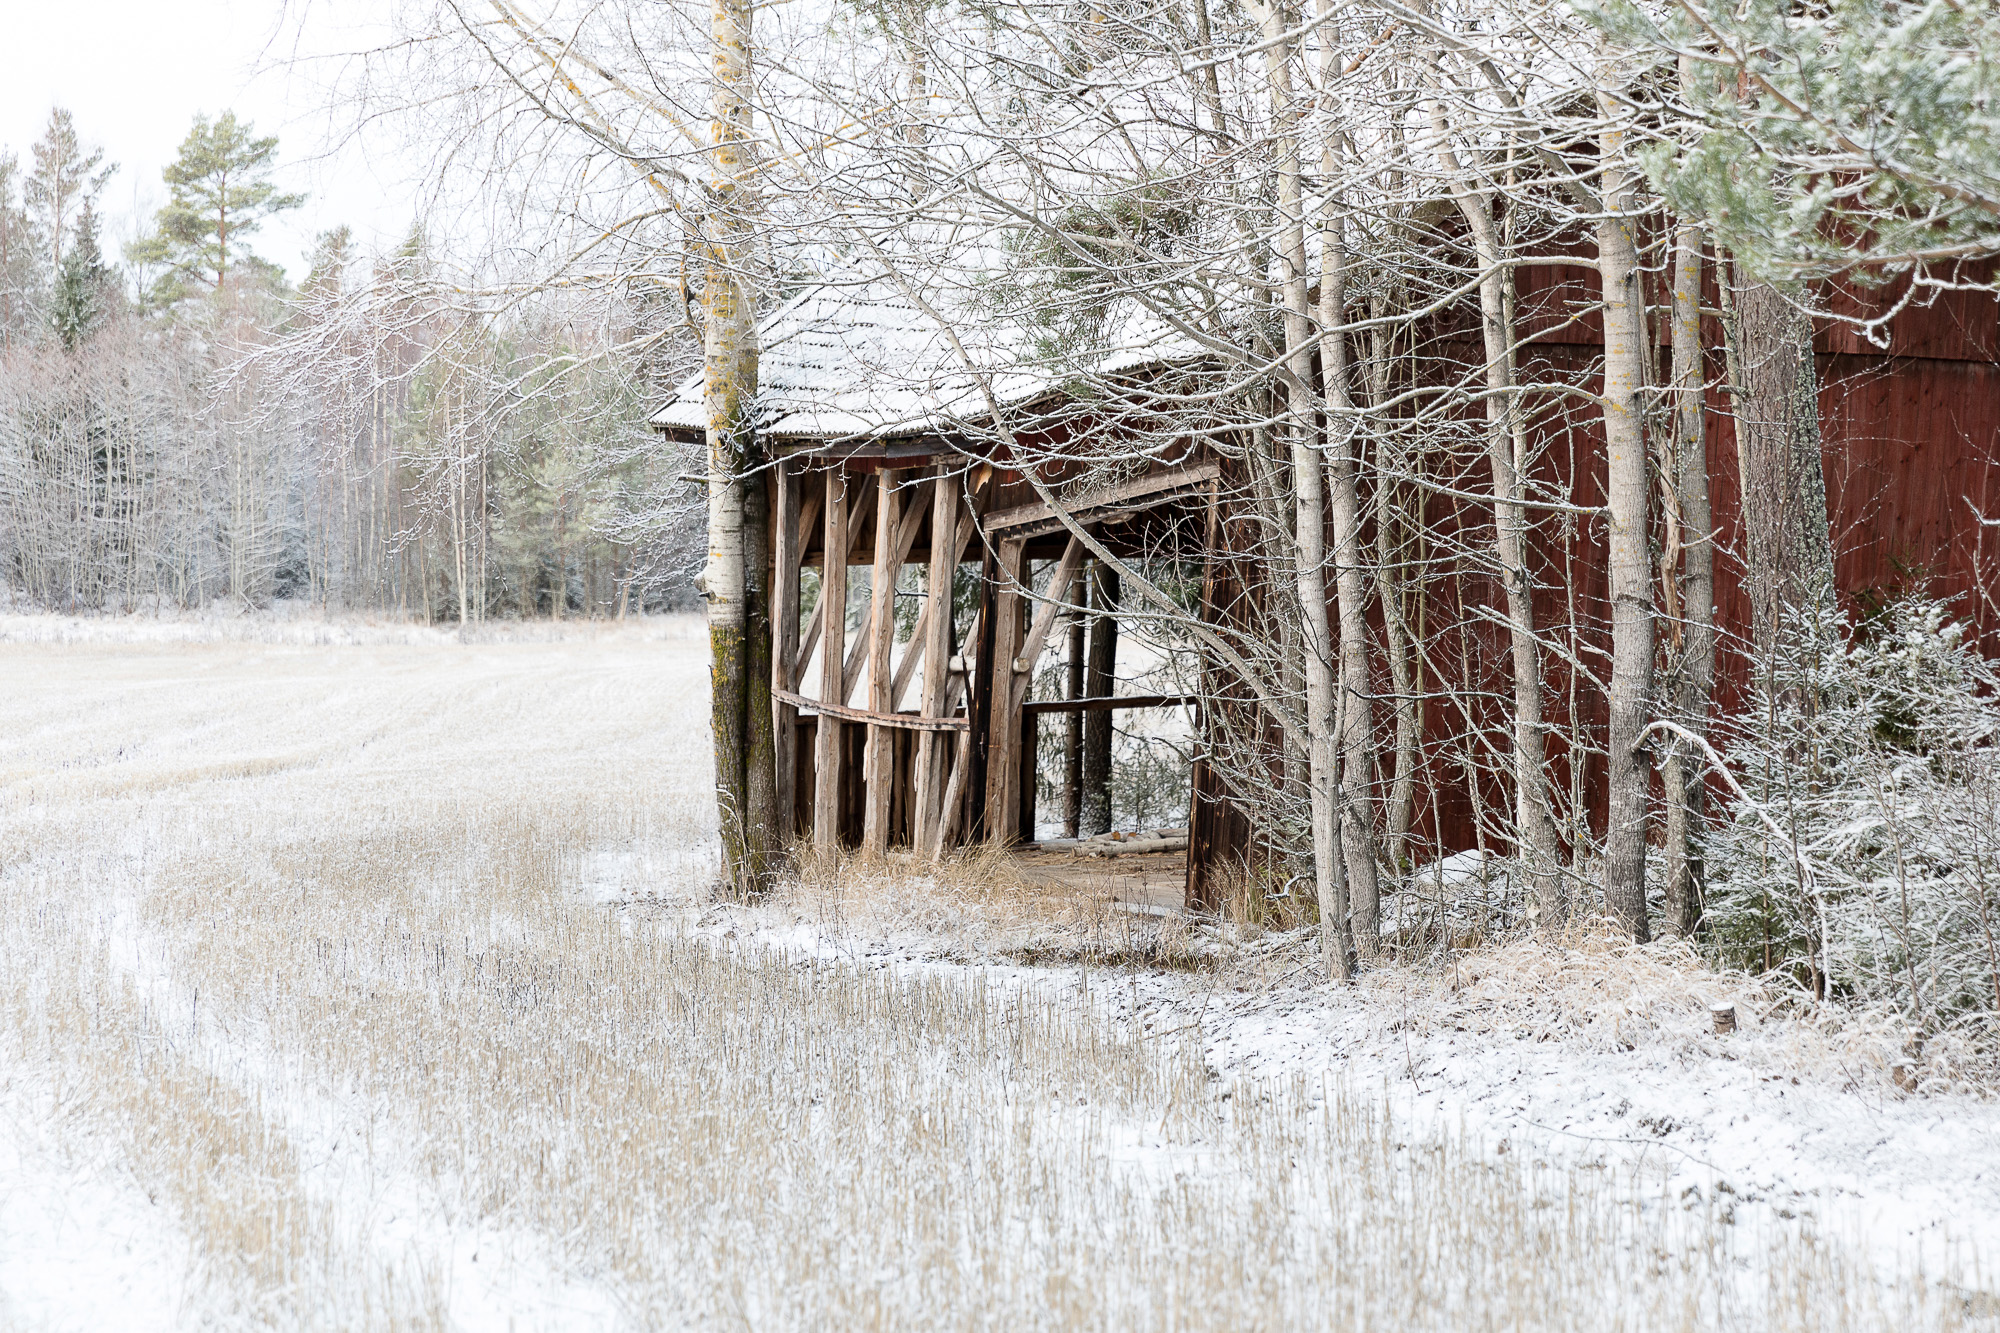 talvi, uusivuosi, Pori, Visitpori, rakastu poriin, valokuvaaja, visualaddict, visualaddictfrida, photographer, Frida Steiner, Rauma